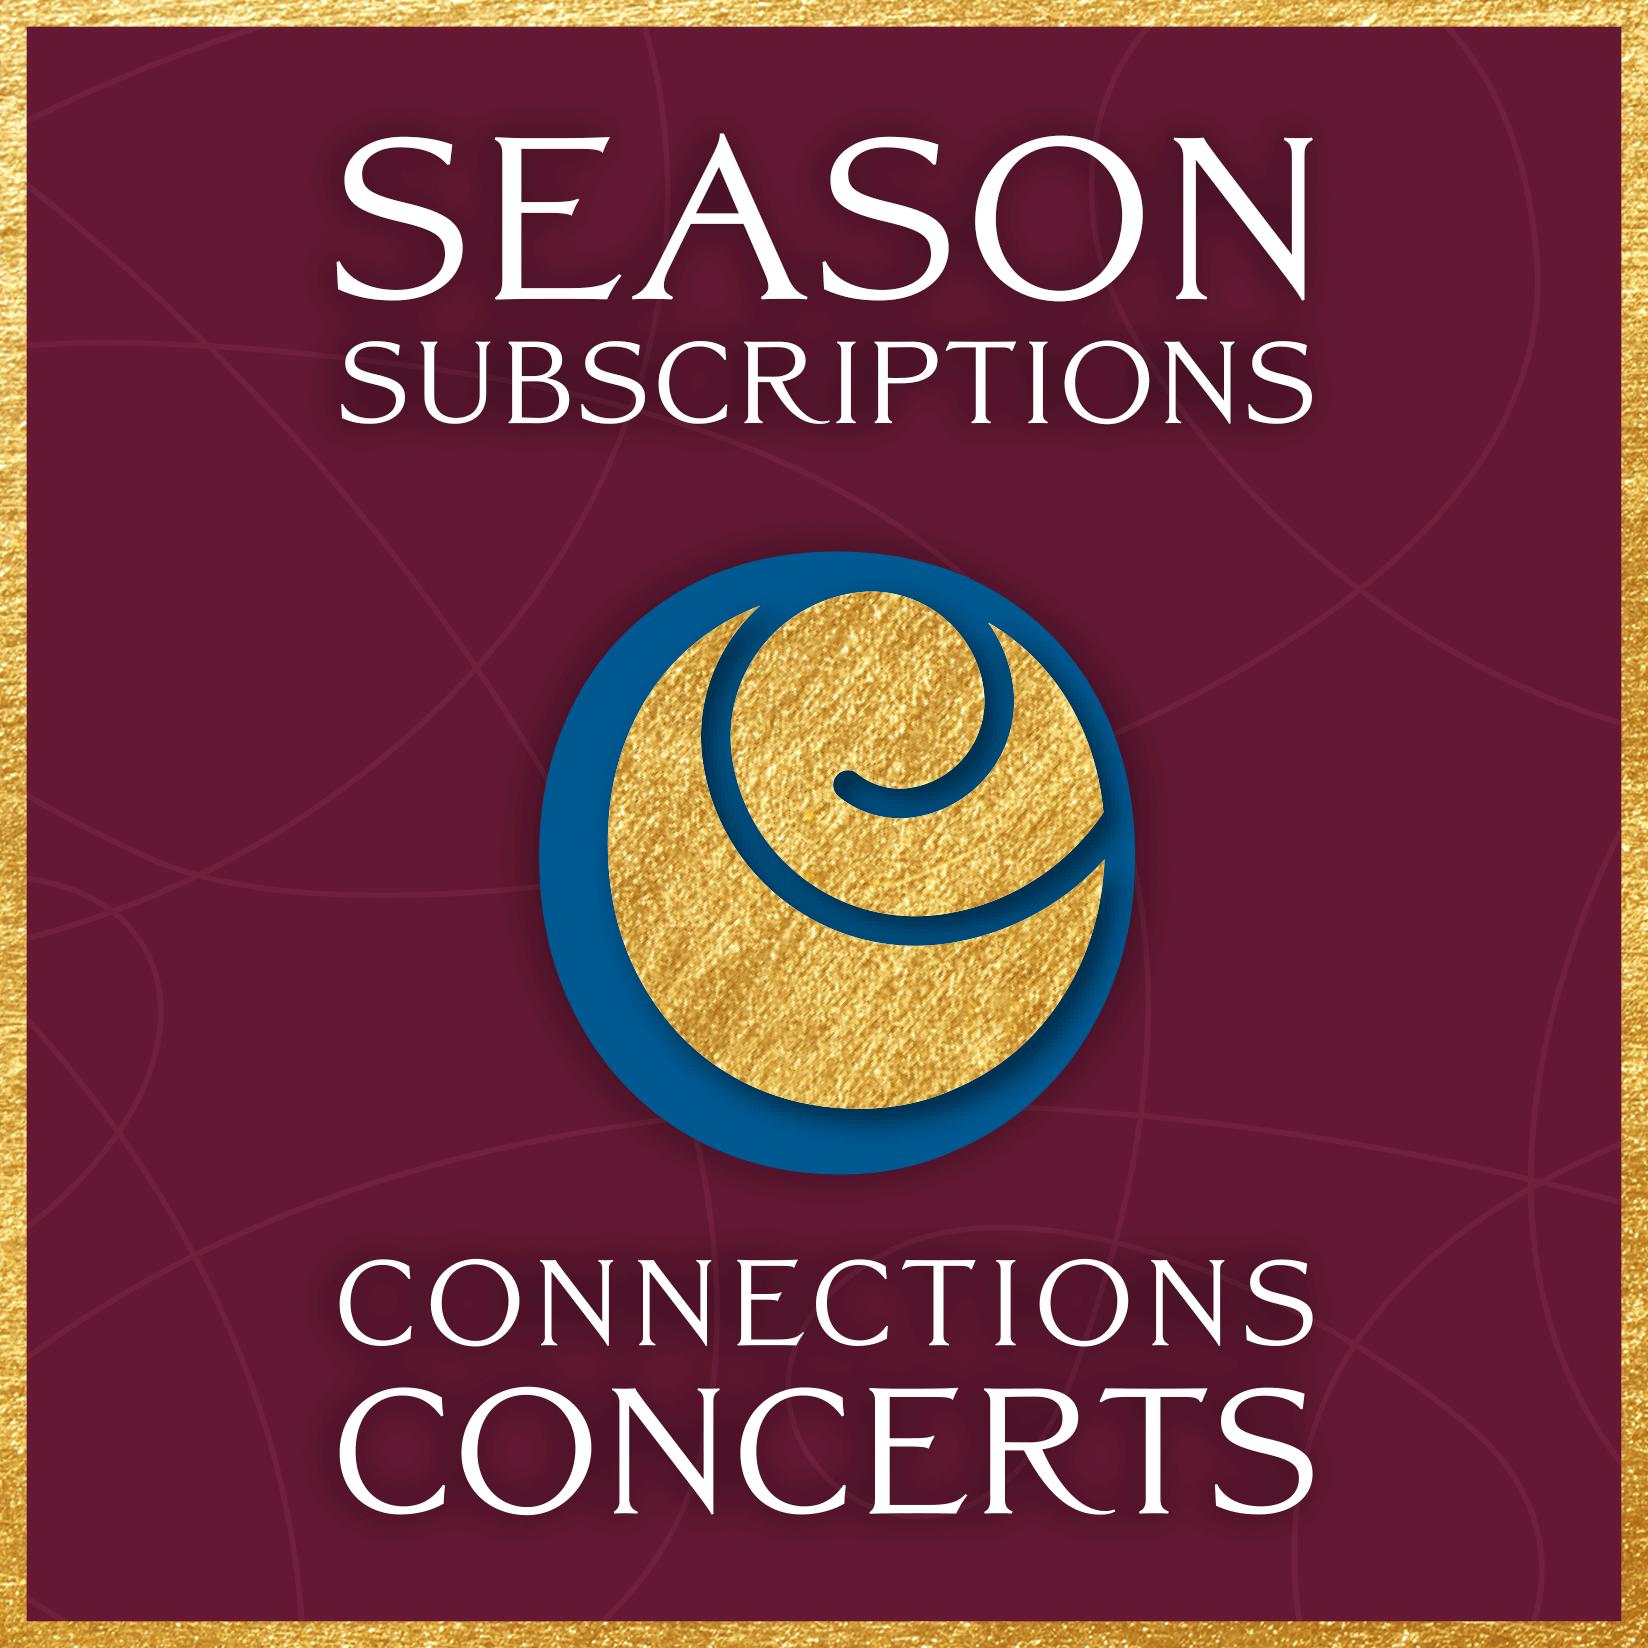 Product-CC-SeasonSubscriptions.png